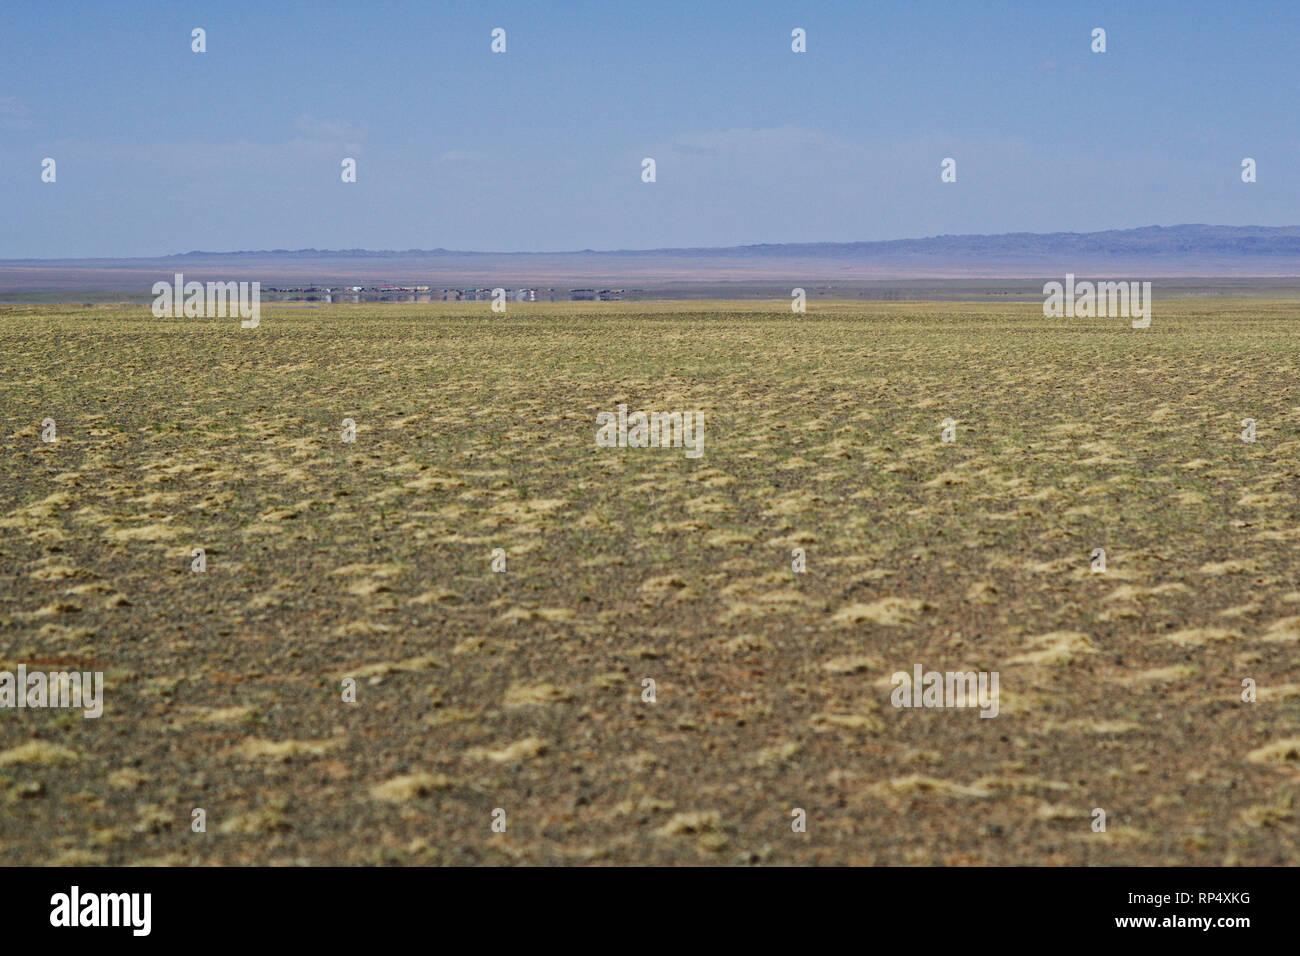 City with mirage, Gobi desert, Omnogov aimag, Mongolia Stock Photo